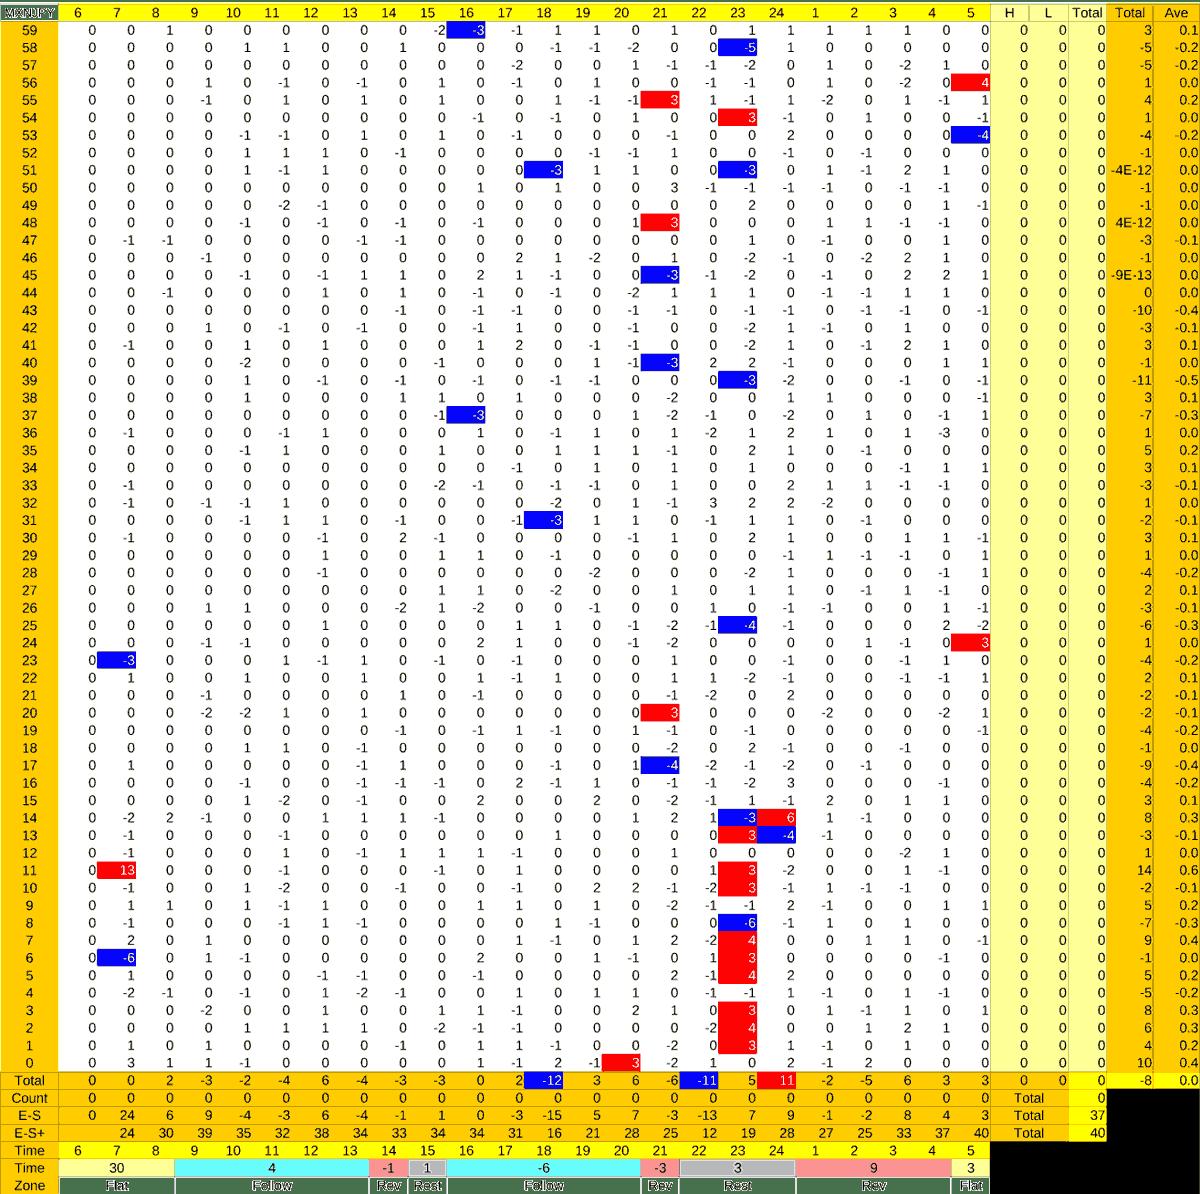 20210503_HS(3)MXNJPY